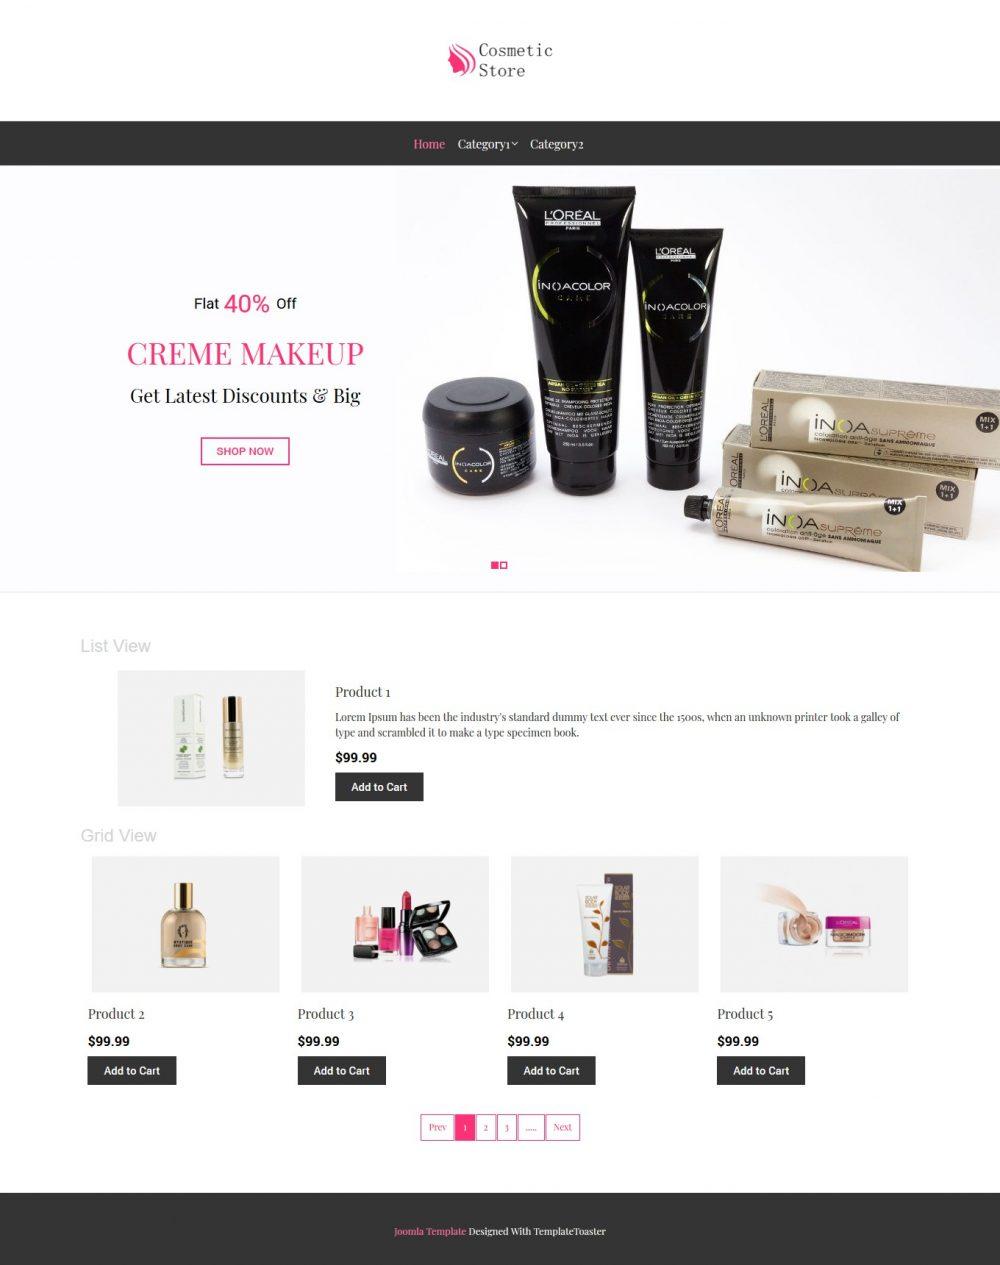 Cosmetic Store Virtuemart Template